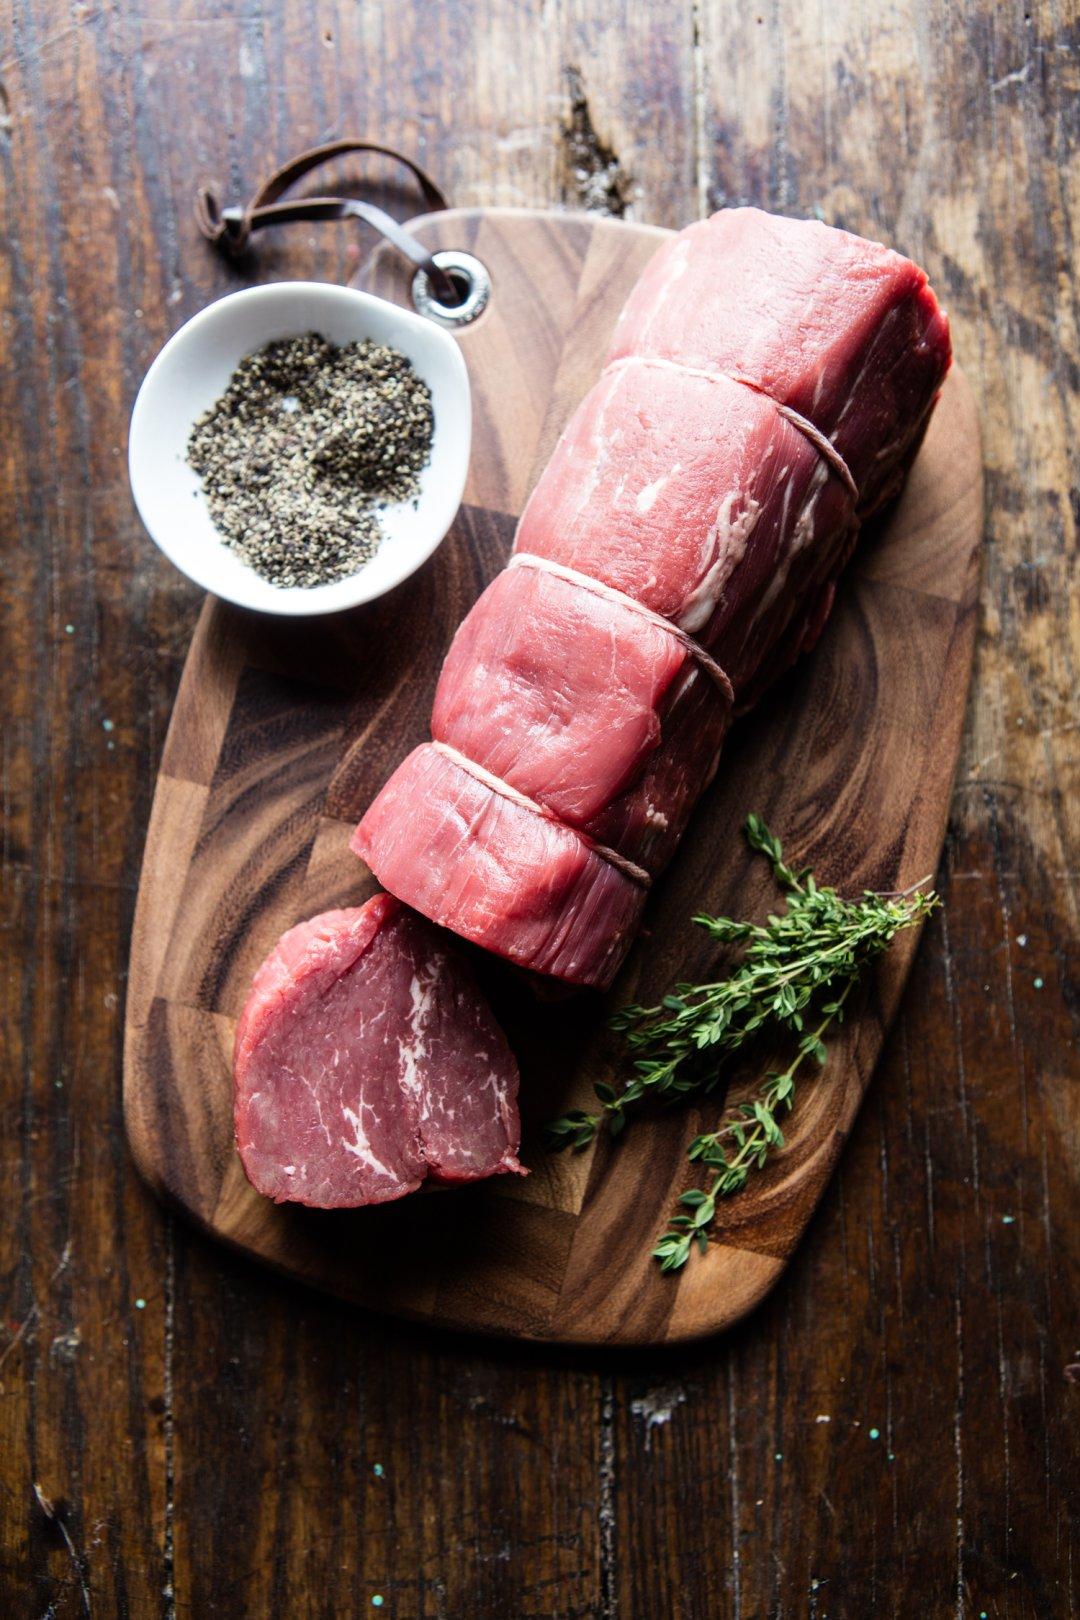 Raw beef filets on cutting board